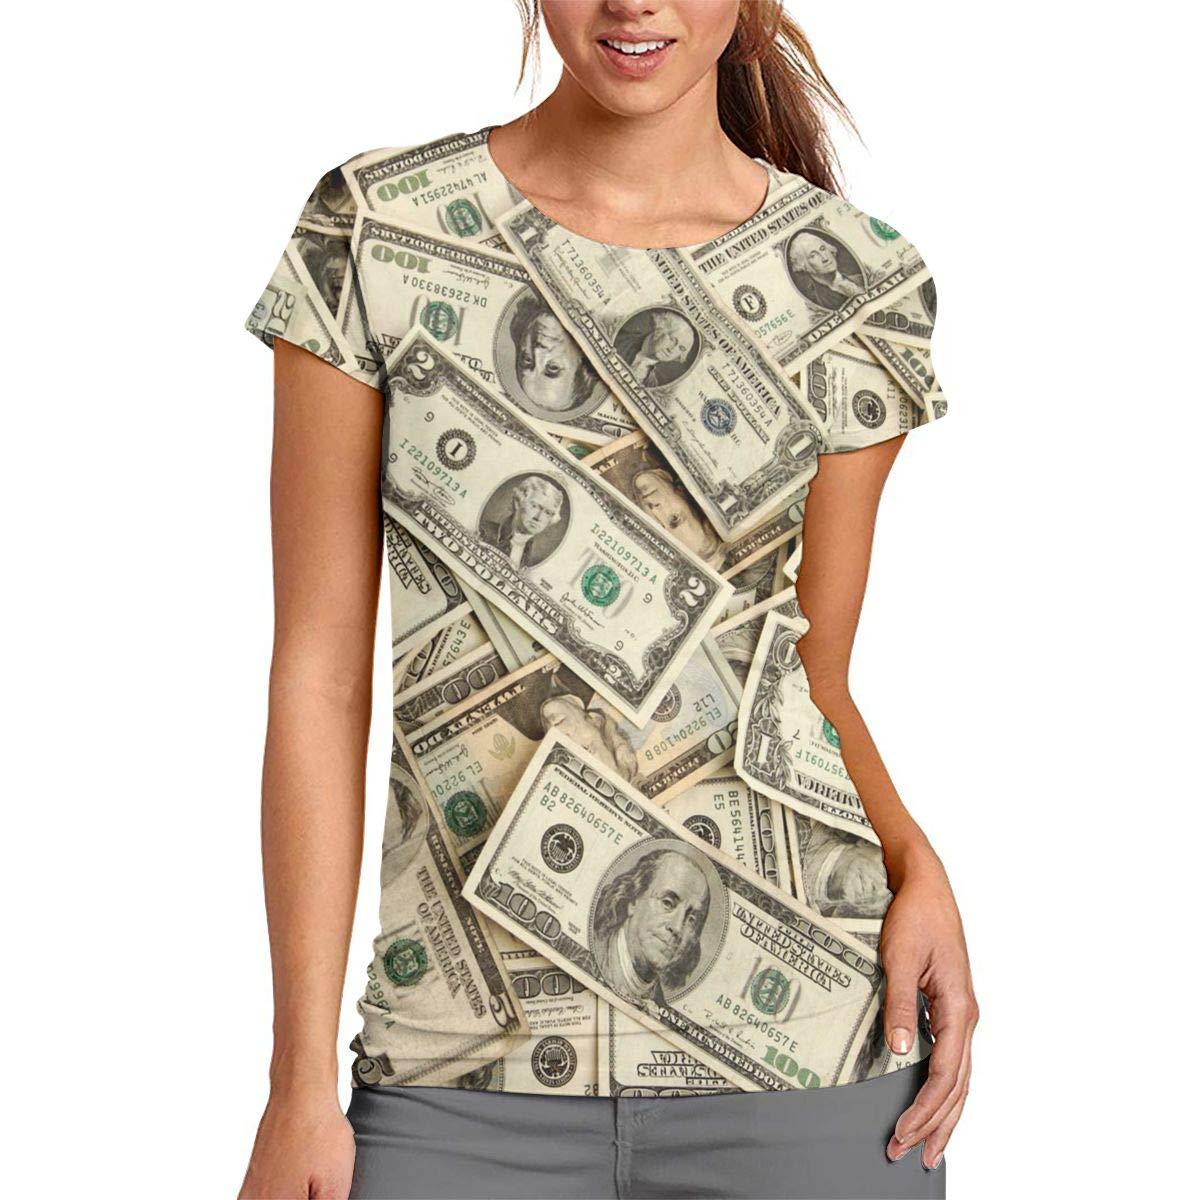 a5a6185a5 BOSYYSTRT US Dollar 100 Women Short Sleeve Baseball Tee Shirts Sports  Raglan T-Shirt at Amazon Women's Clothing store: